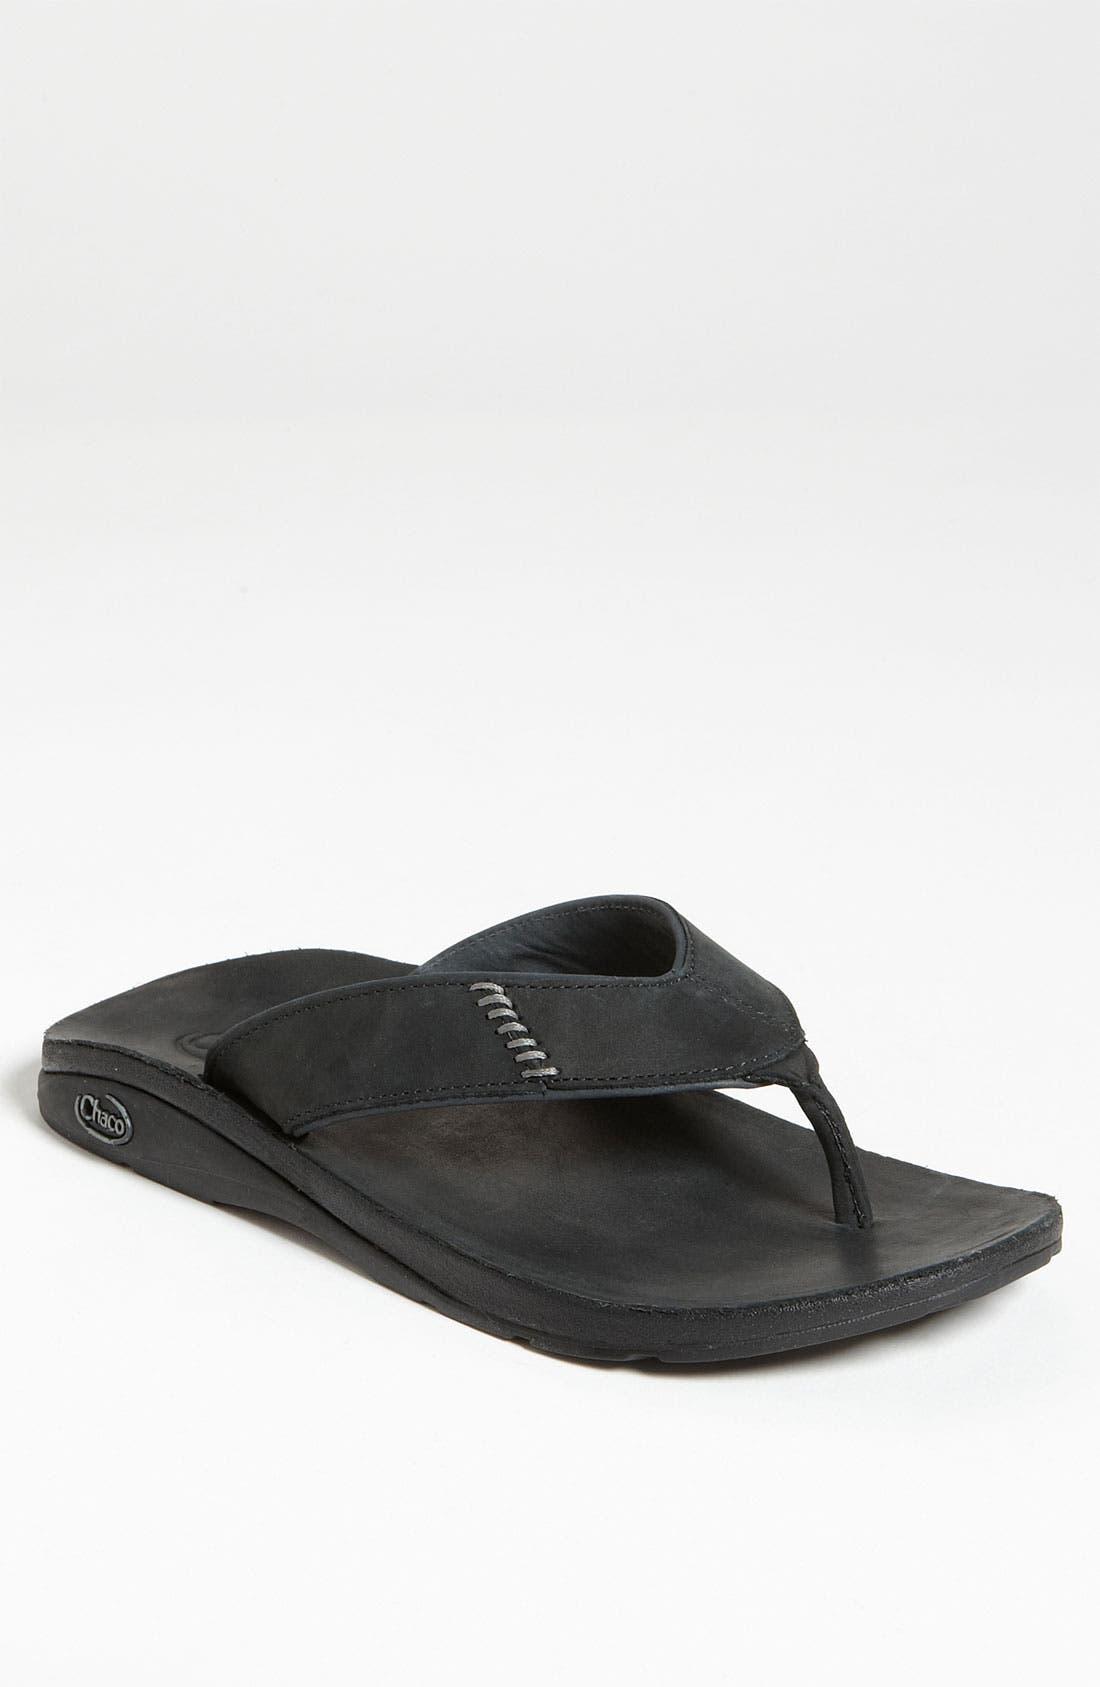 Main Image - Chaco 'Cordonazo' Flip Flop